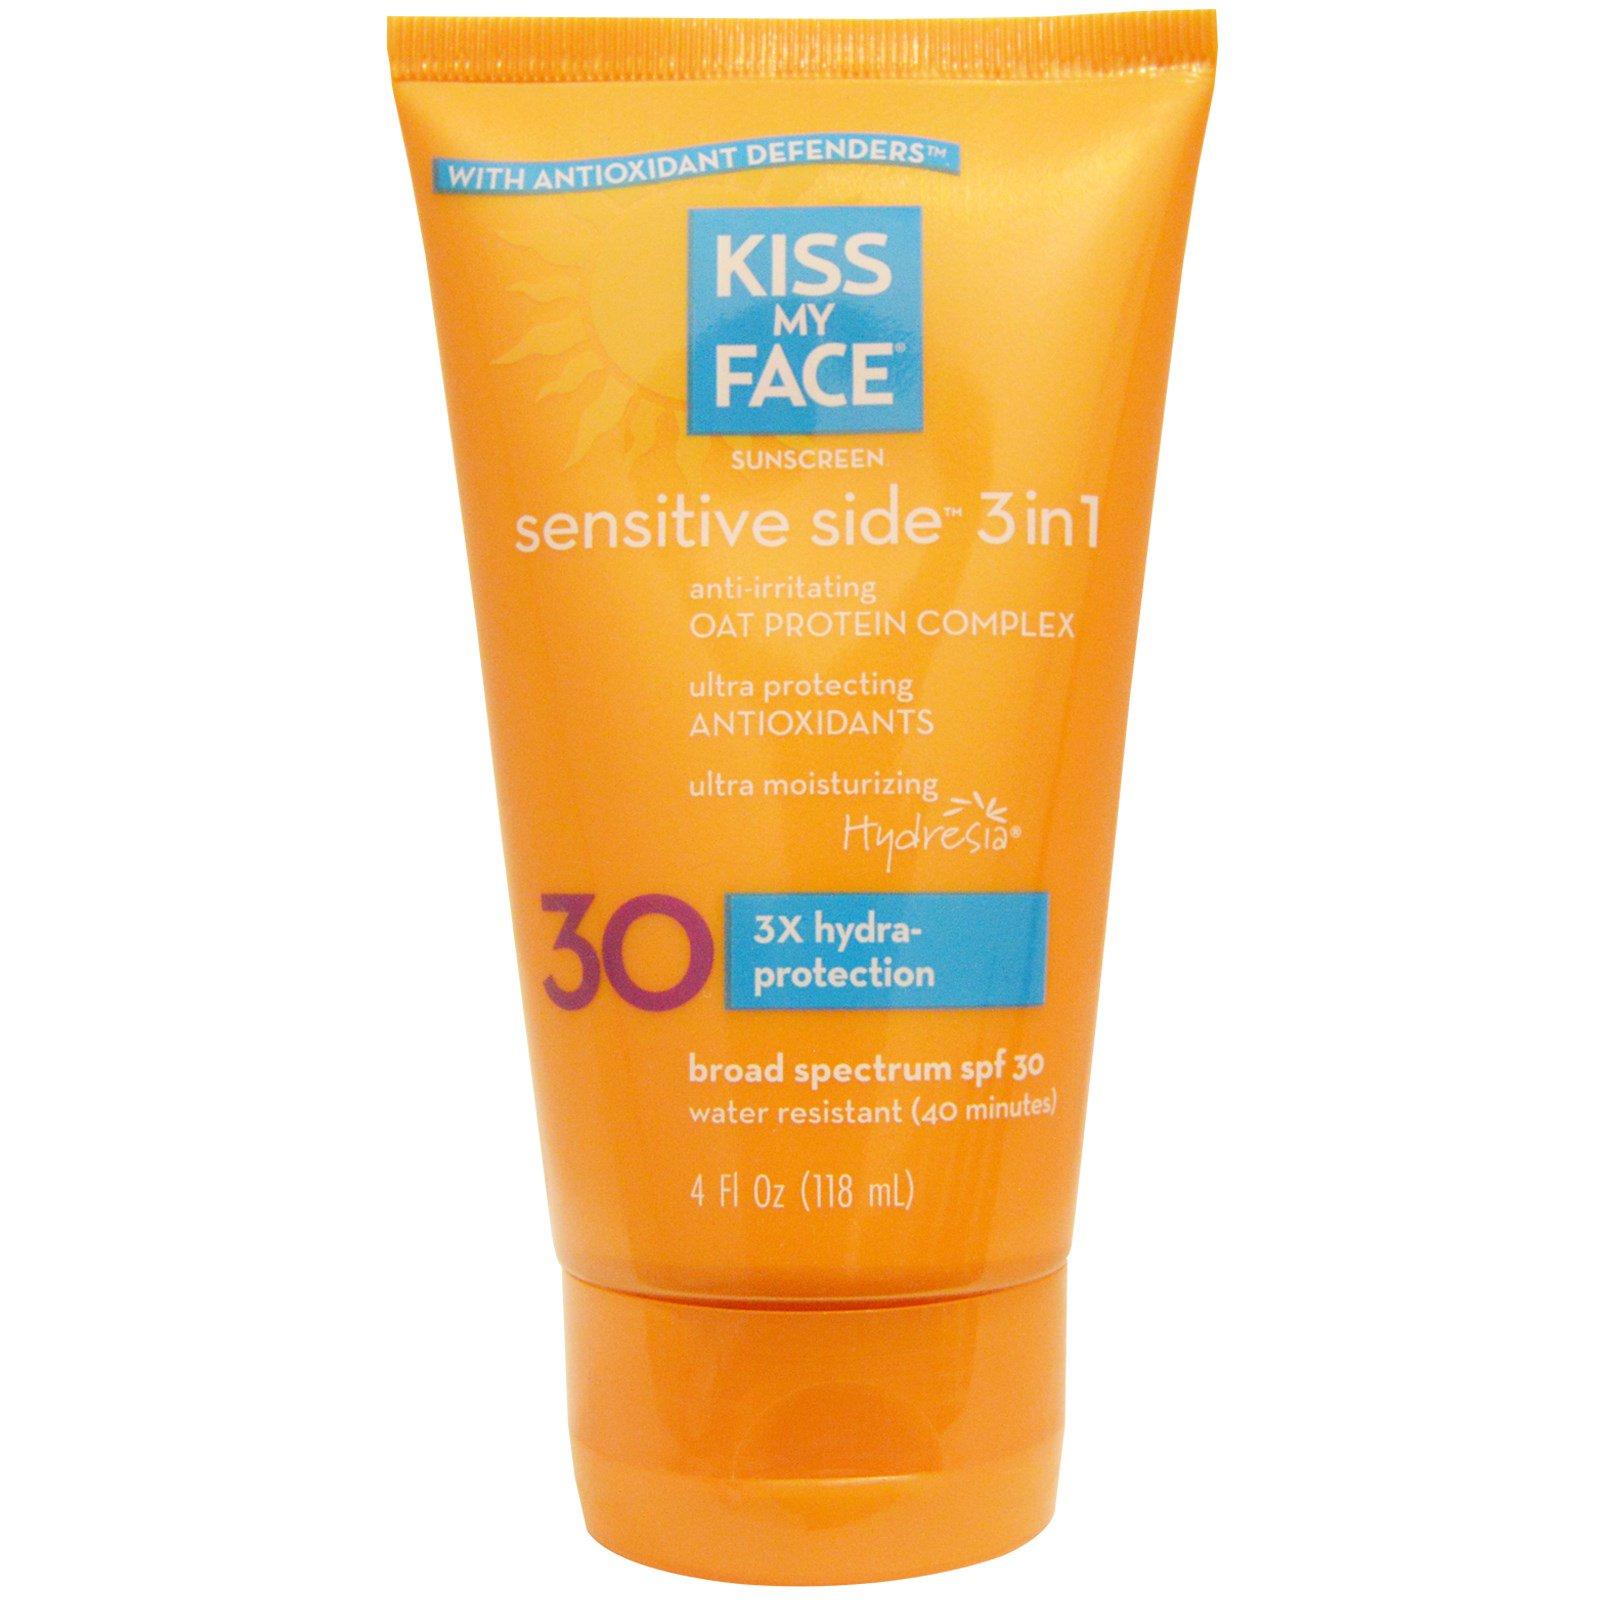 Kiss My Face, Sensitive Side солнцезащитное средство 3 в 1, SPF 30, 4 жидкие унции (118 мл)